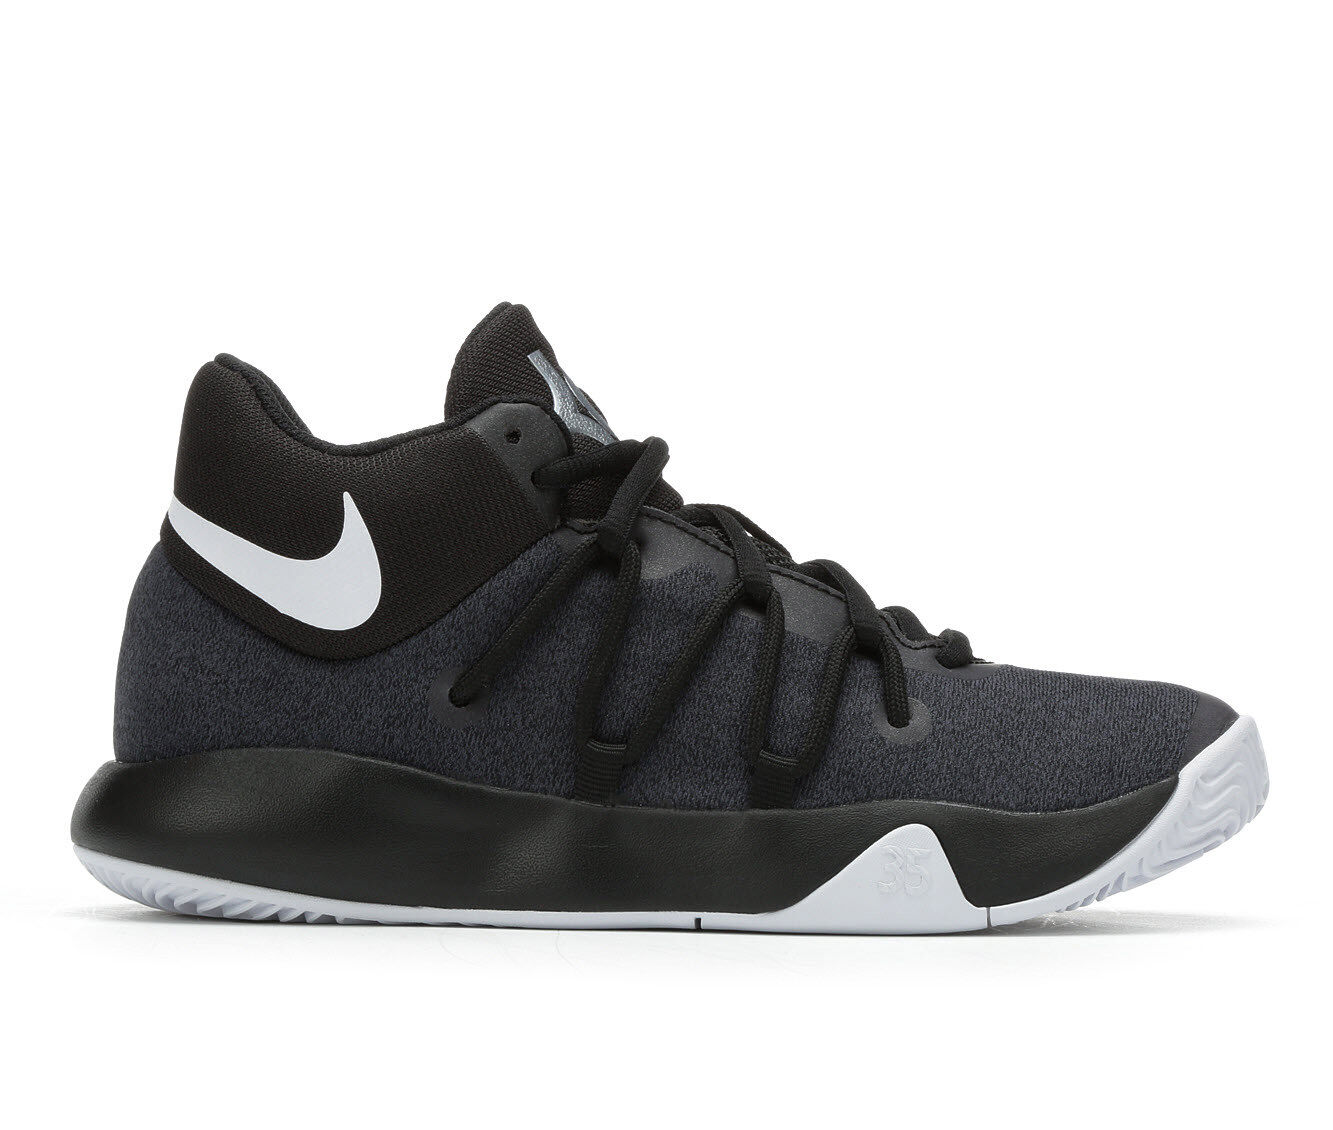 check out c441e e63e5 ... where can i buy nike big kid kd trey 5 v high top basketball shoes.